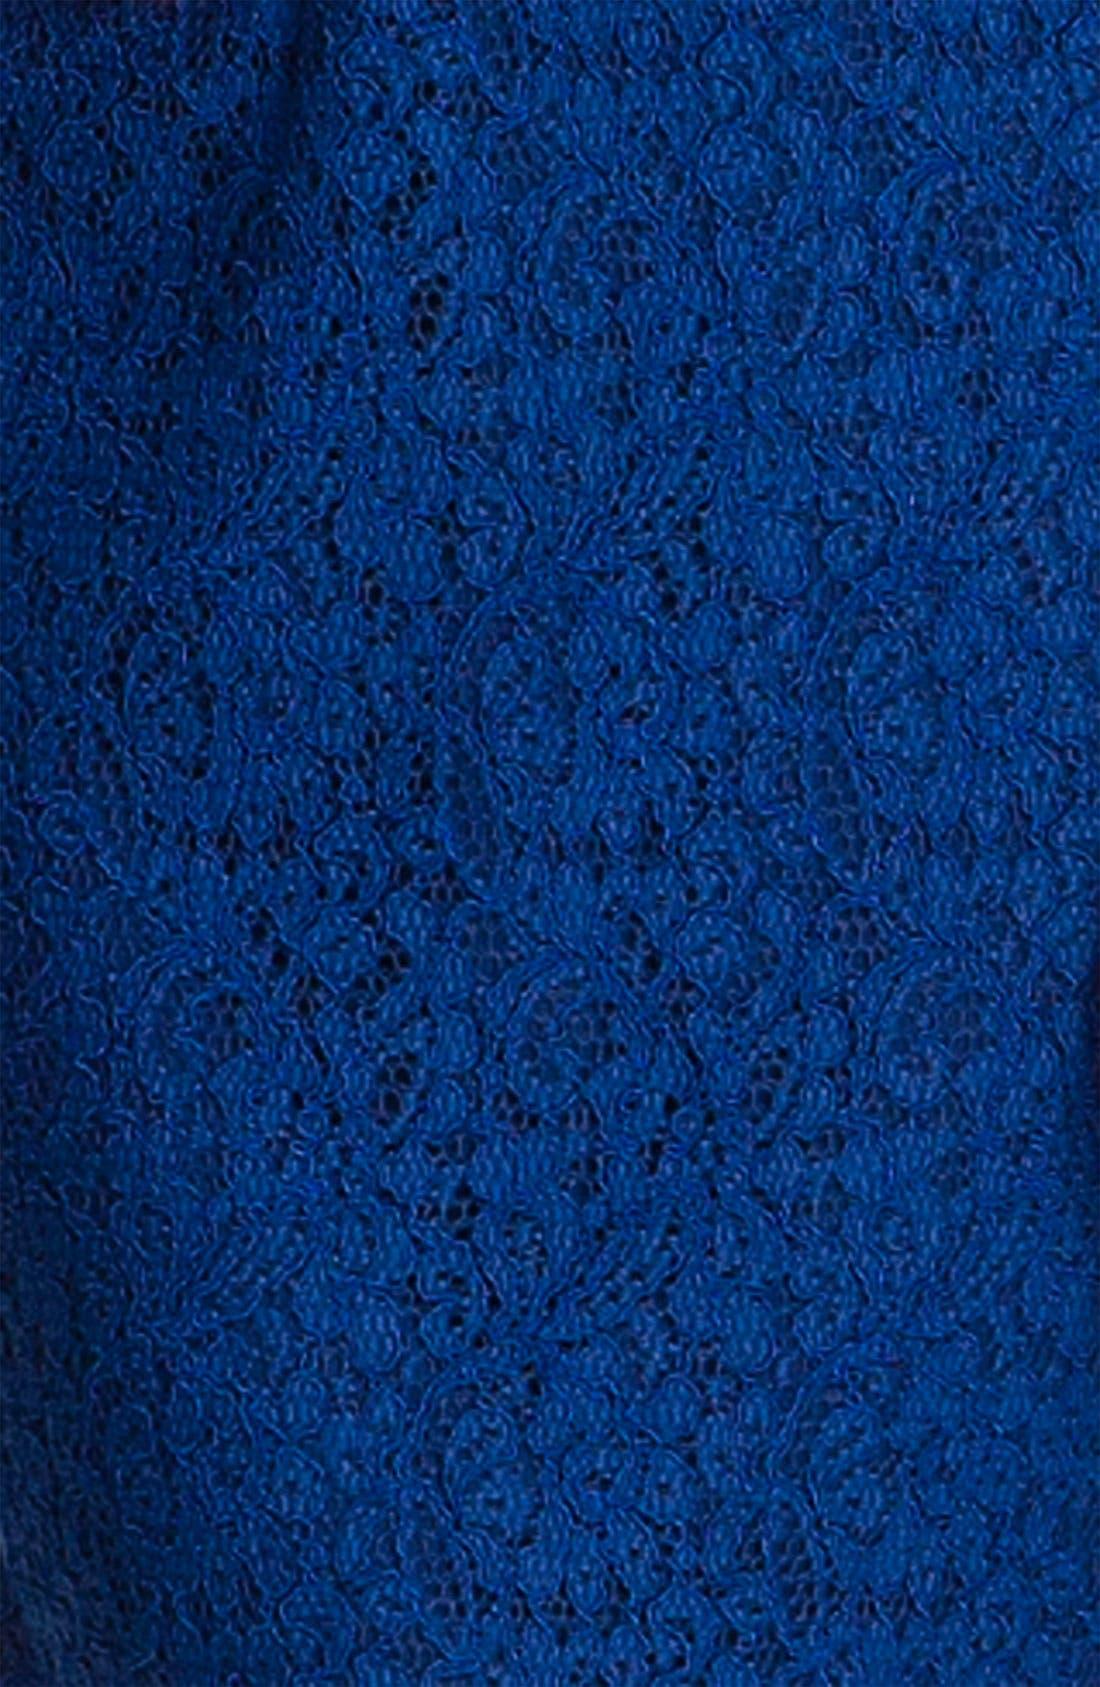 Boatneck Lace Sheath Dress,                             Alternate thumbnail 131, color,